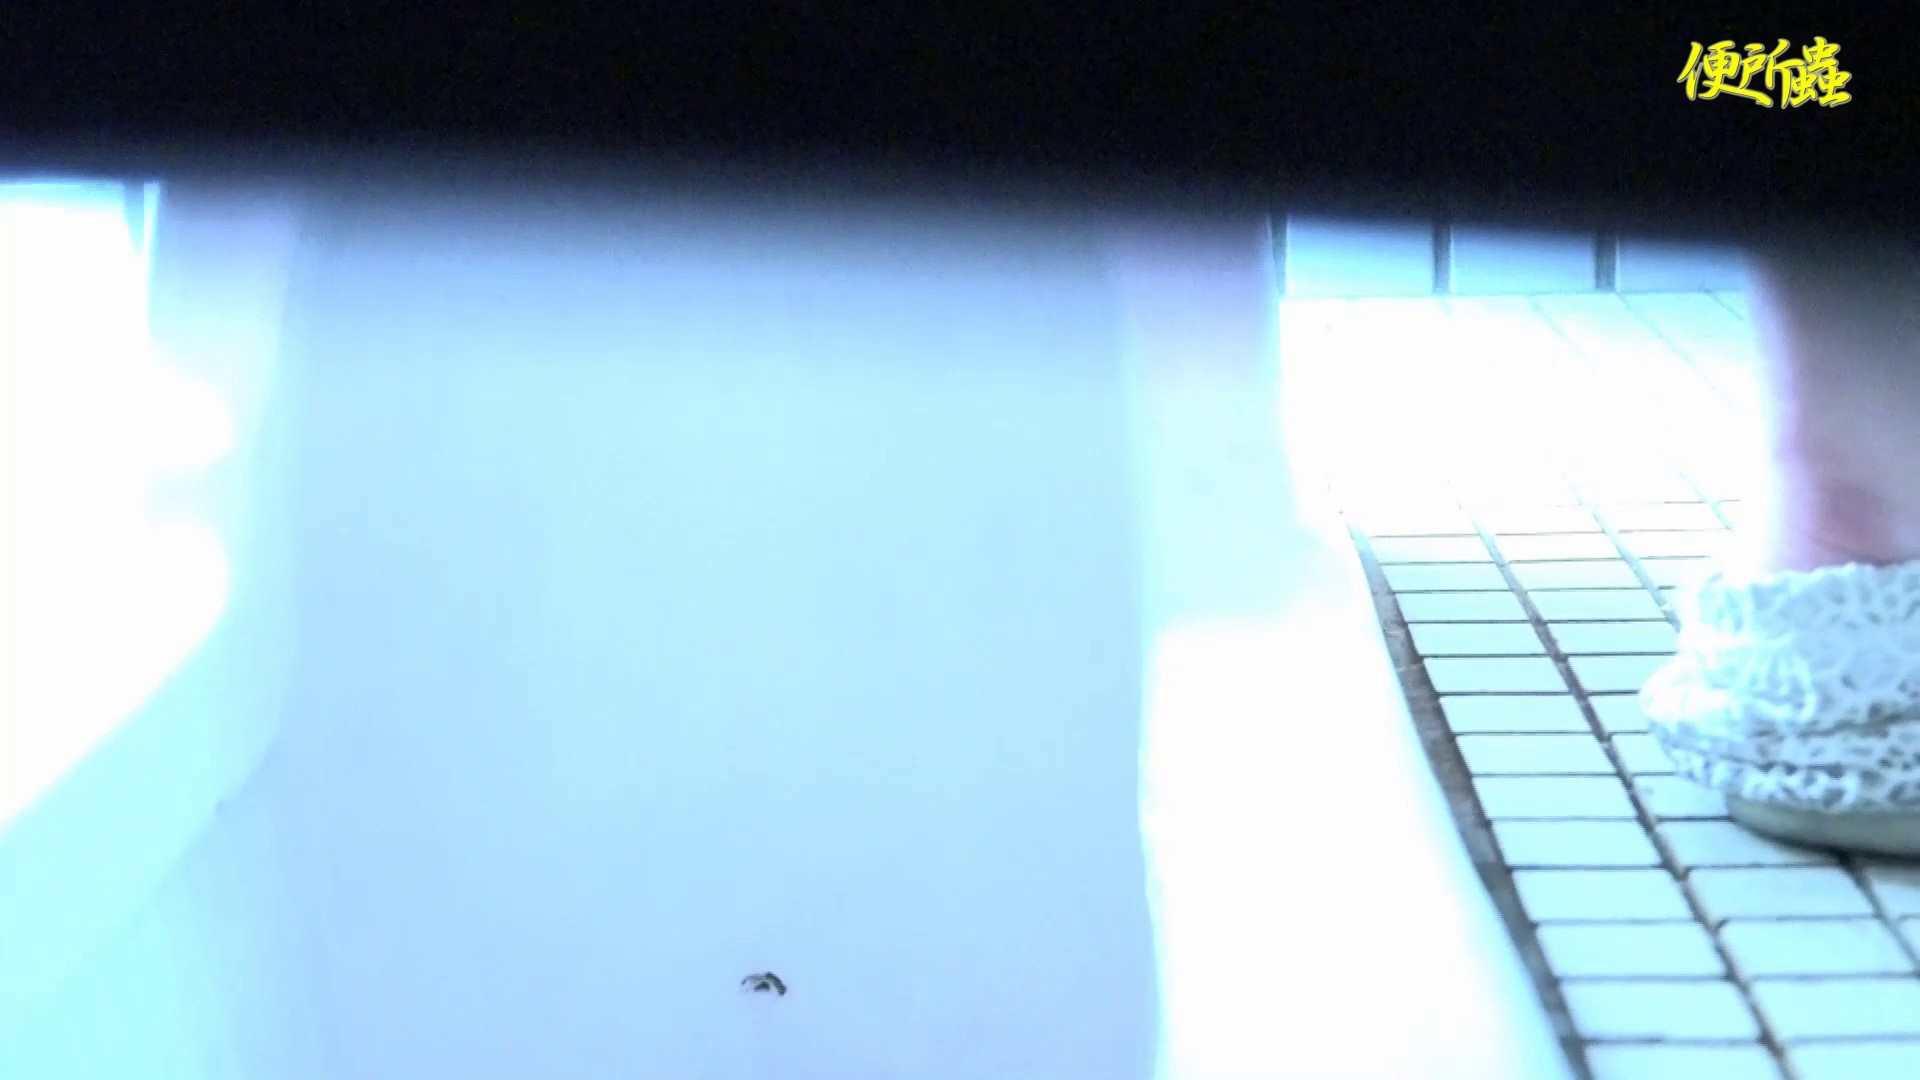 vol.01 便所蟲さんのリターン~便所蟲2匹目~ 洗面所着替え | 盗撮エロすぎ  78連発 22